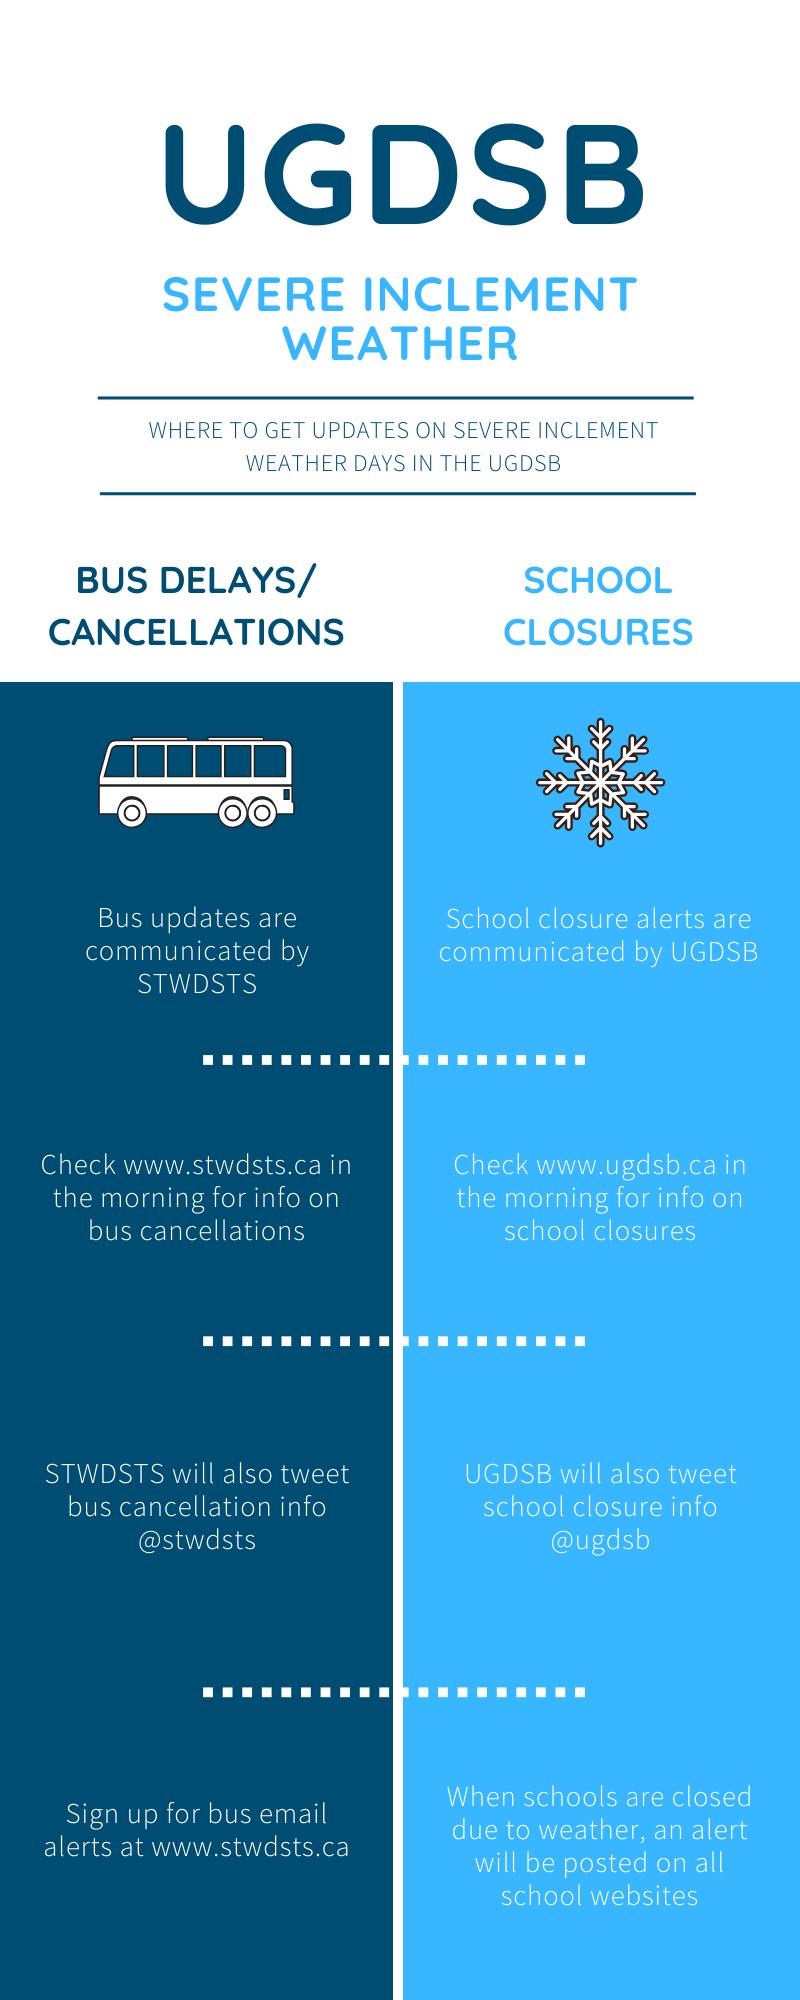 UGDSB Inclement Weather Infographic Nov. 2019